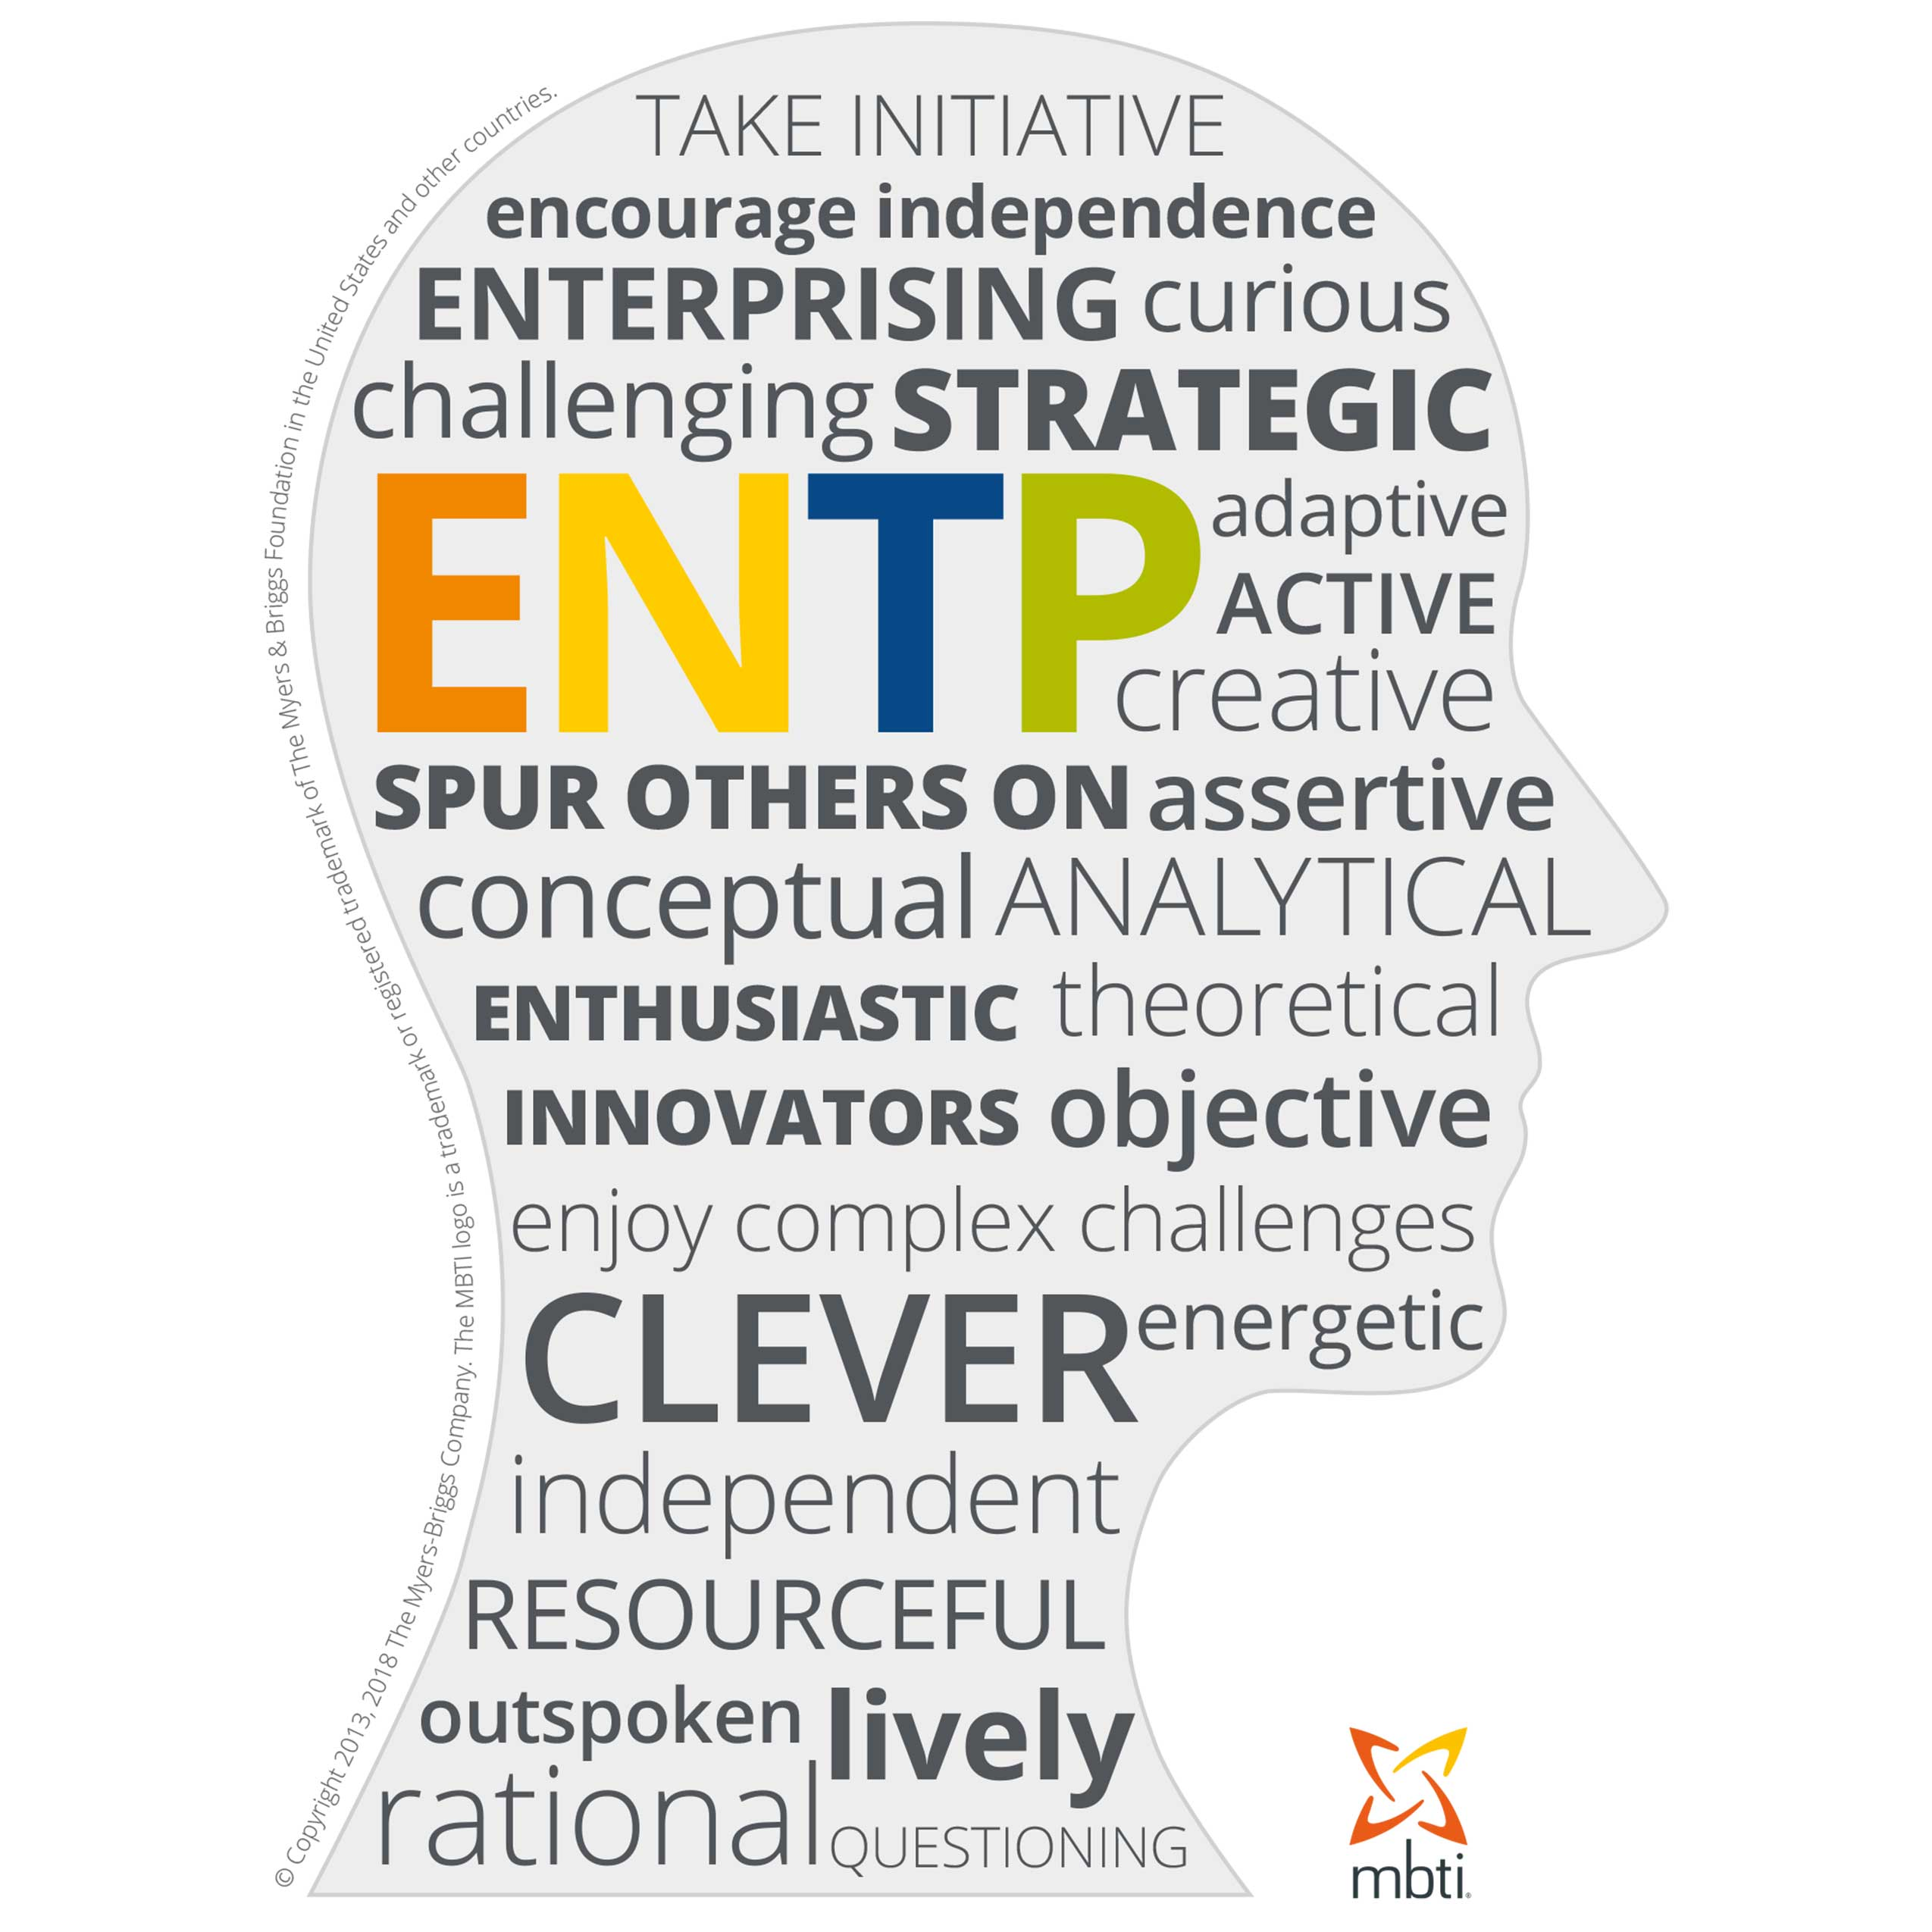 MBTI Myers-Briggs Personality Type Characteristics ENTP